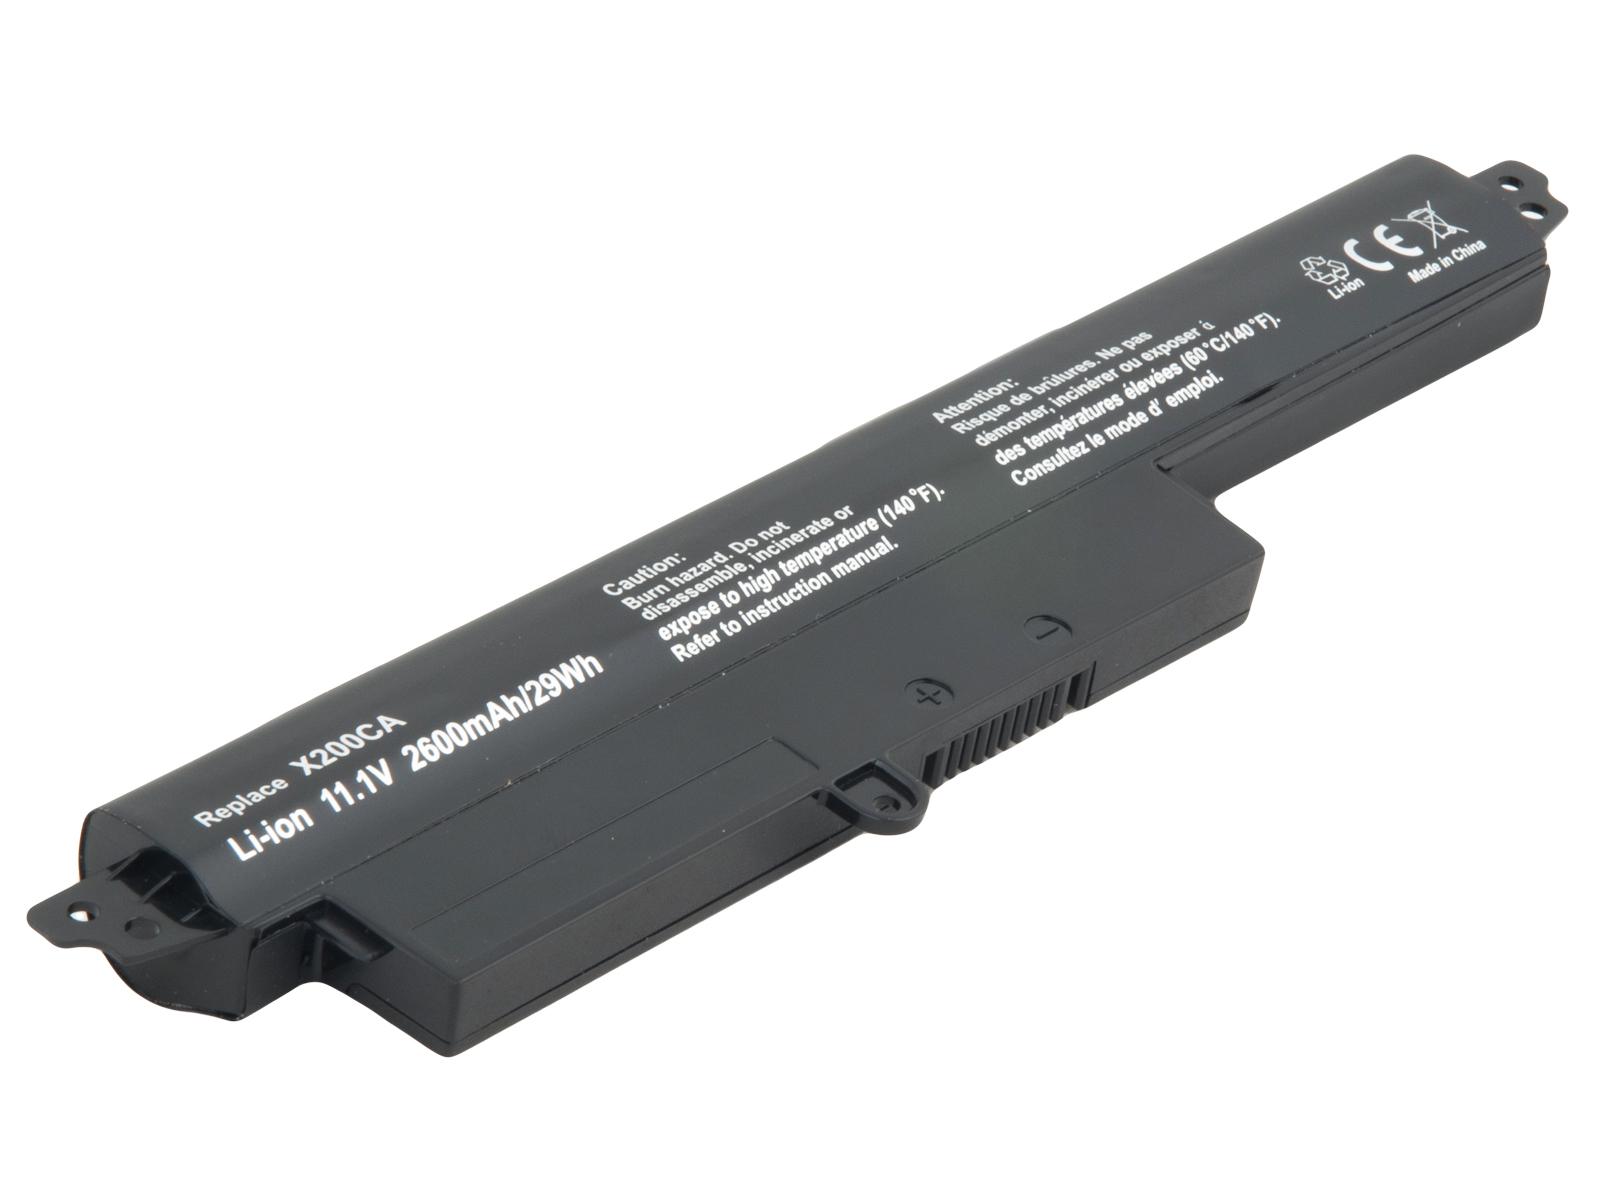 Baterie AVACOM pro Asus VivoBook X200CA Li-Ion 11,25V 2600mAh 29Wh; NOAS-X200-N26